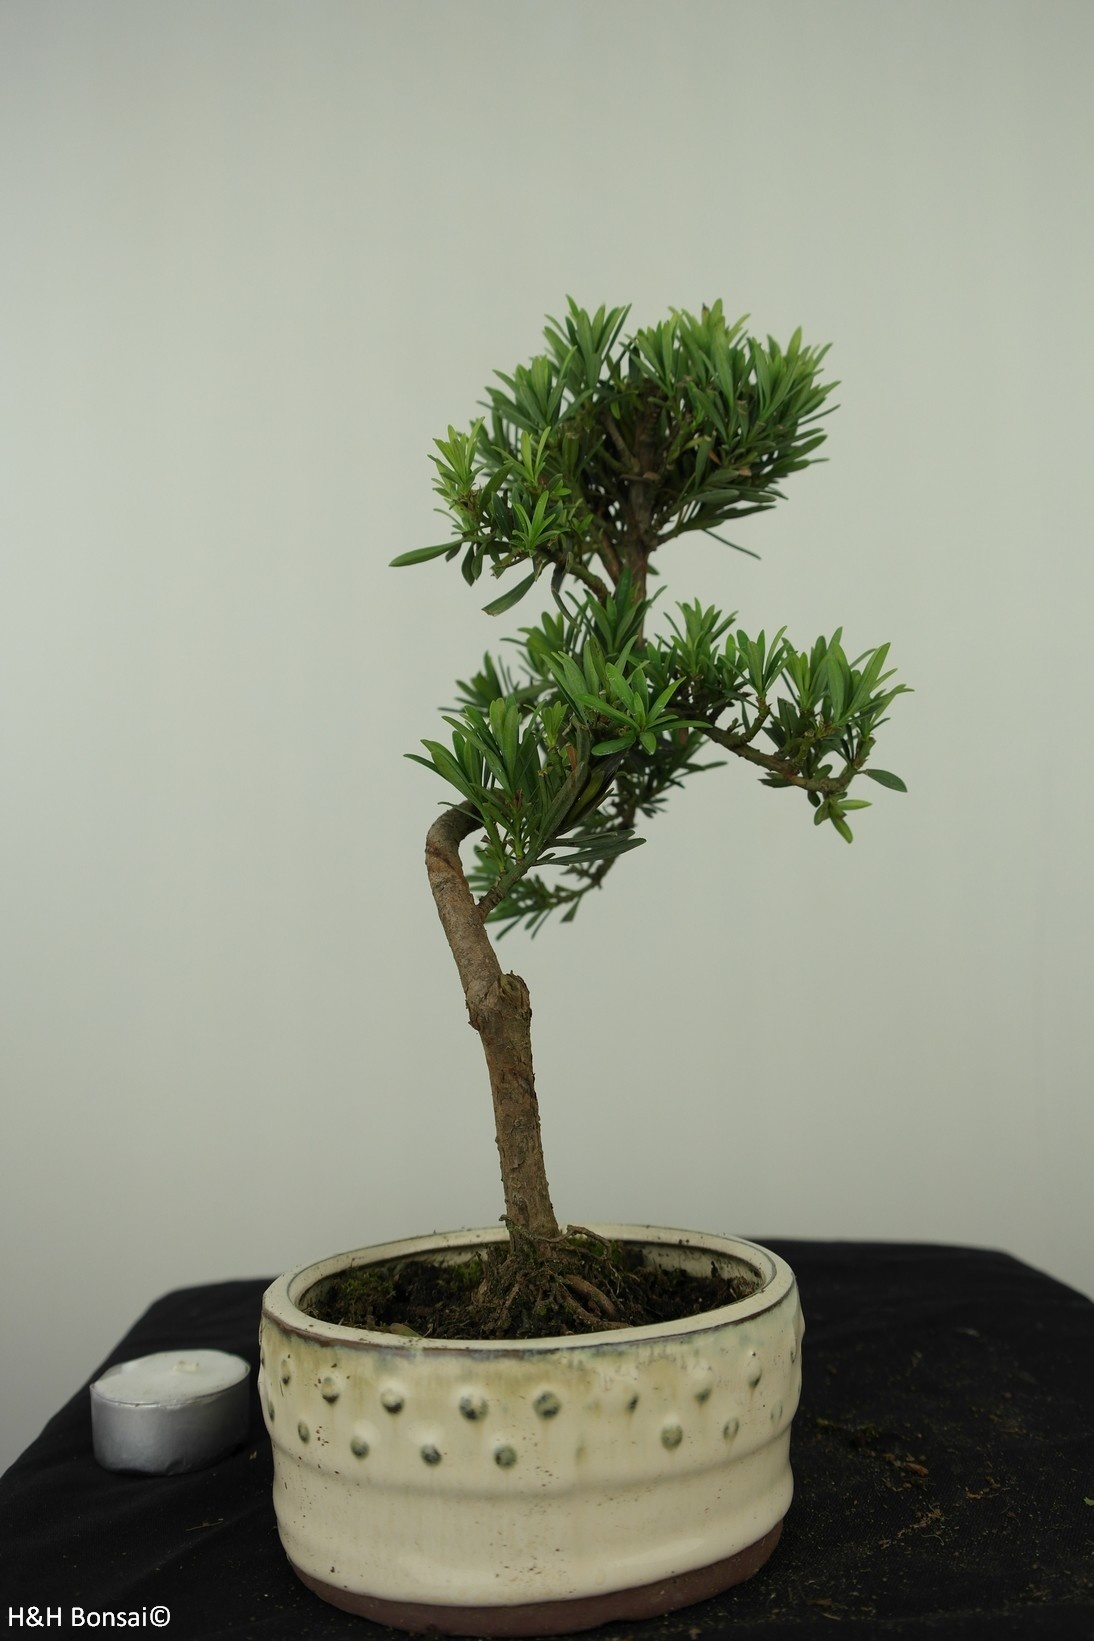 Bonsai Chin. Steineibe, Podocarpus, nr. 7560